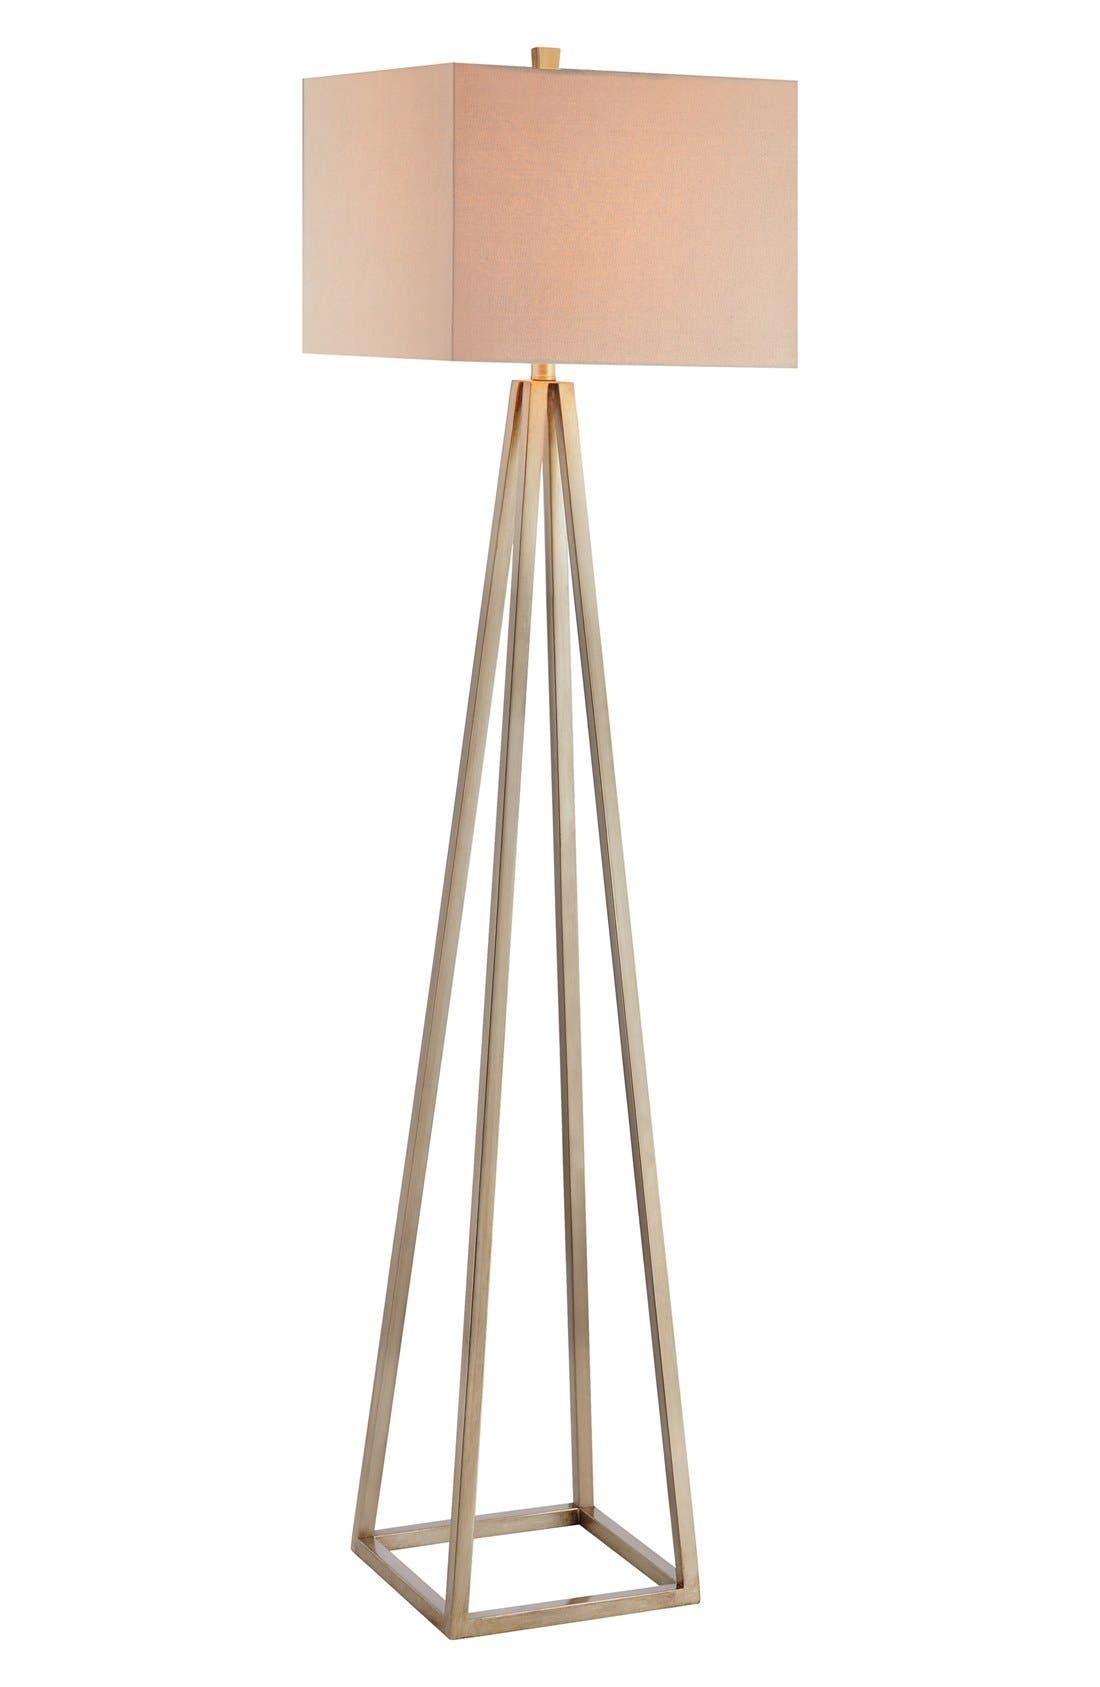 Alternate Image 1 Selected - JAlexander Lighting Open Caged Metal Floor Lamp